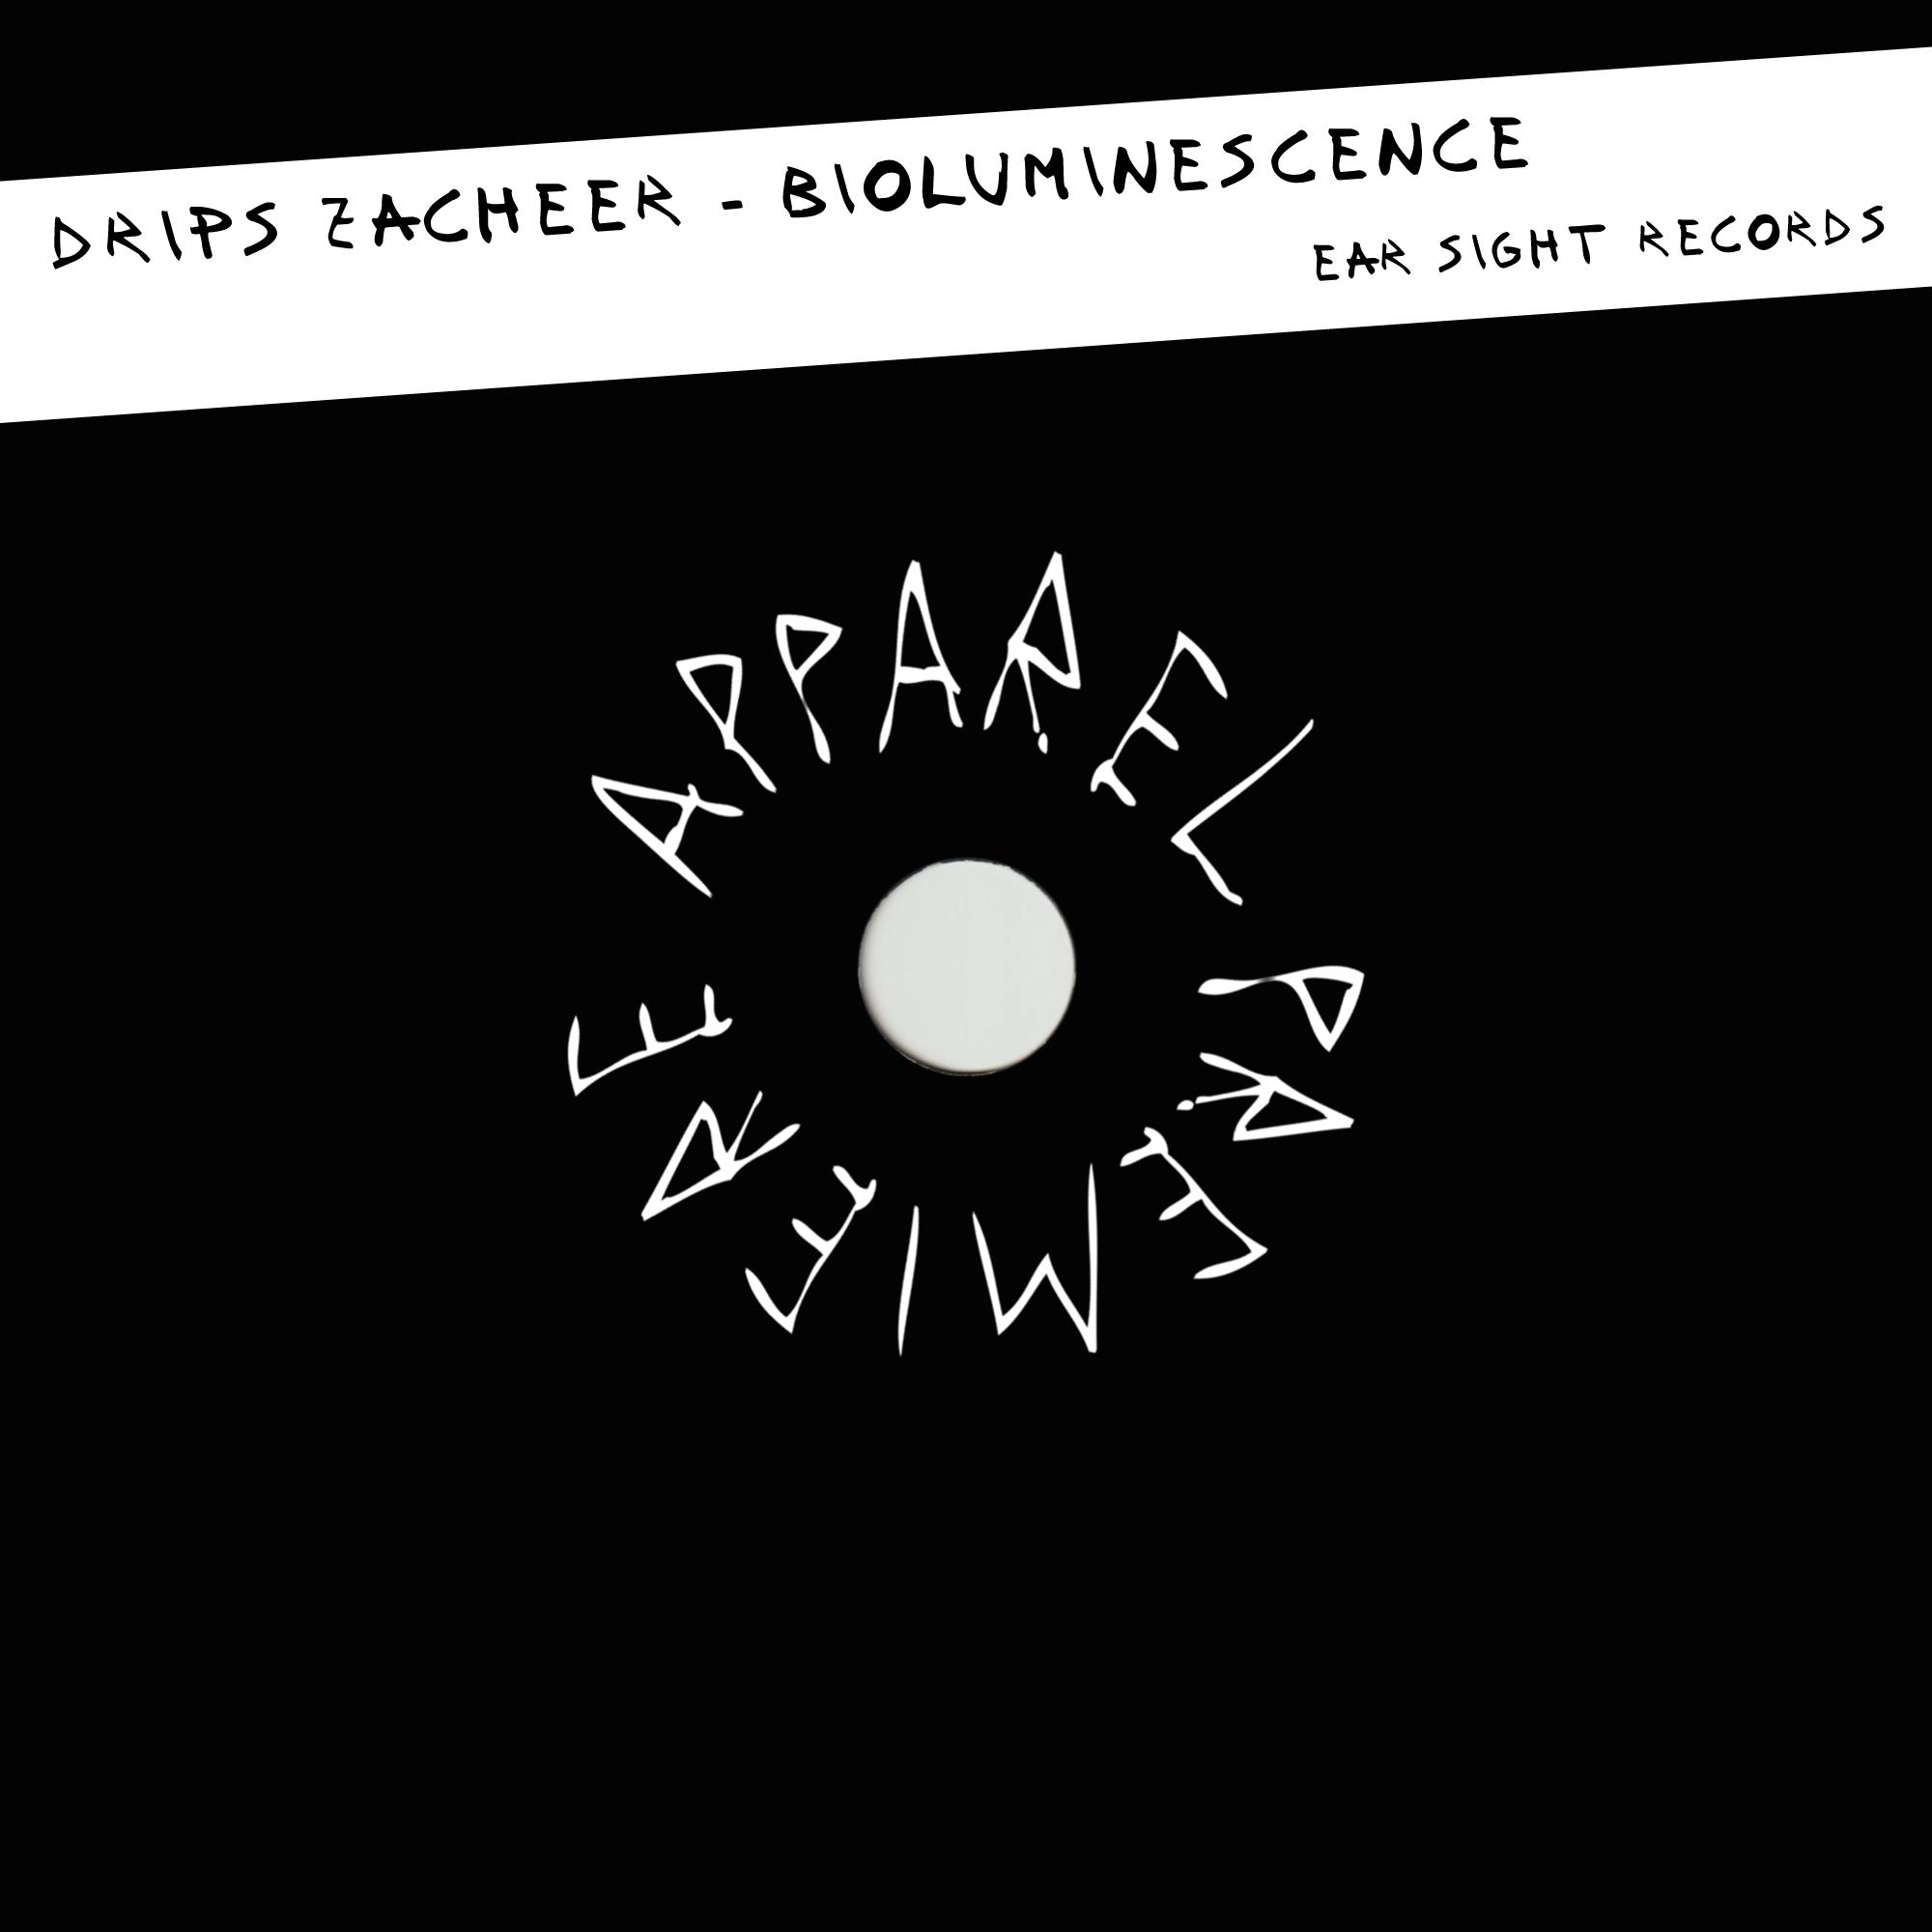 APPAREL PREMIERE: Drips Zacheer – Bioluminescence [Ear Sight]